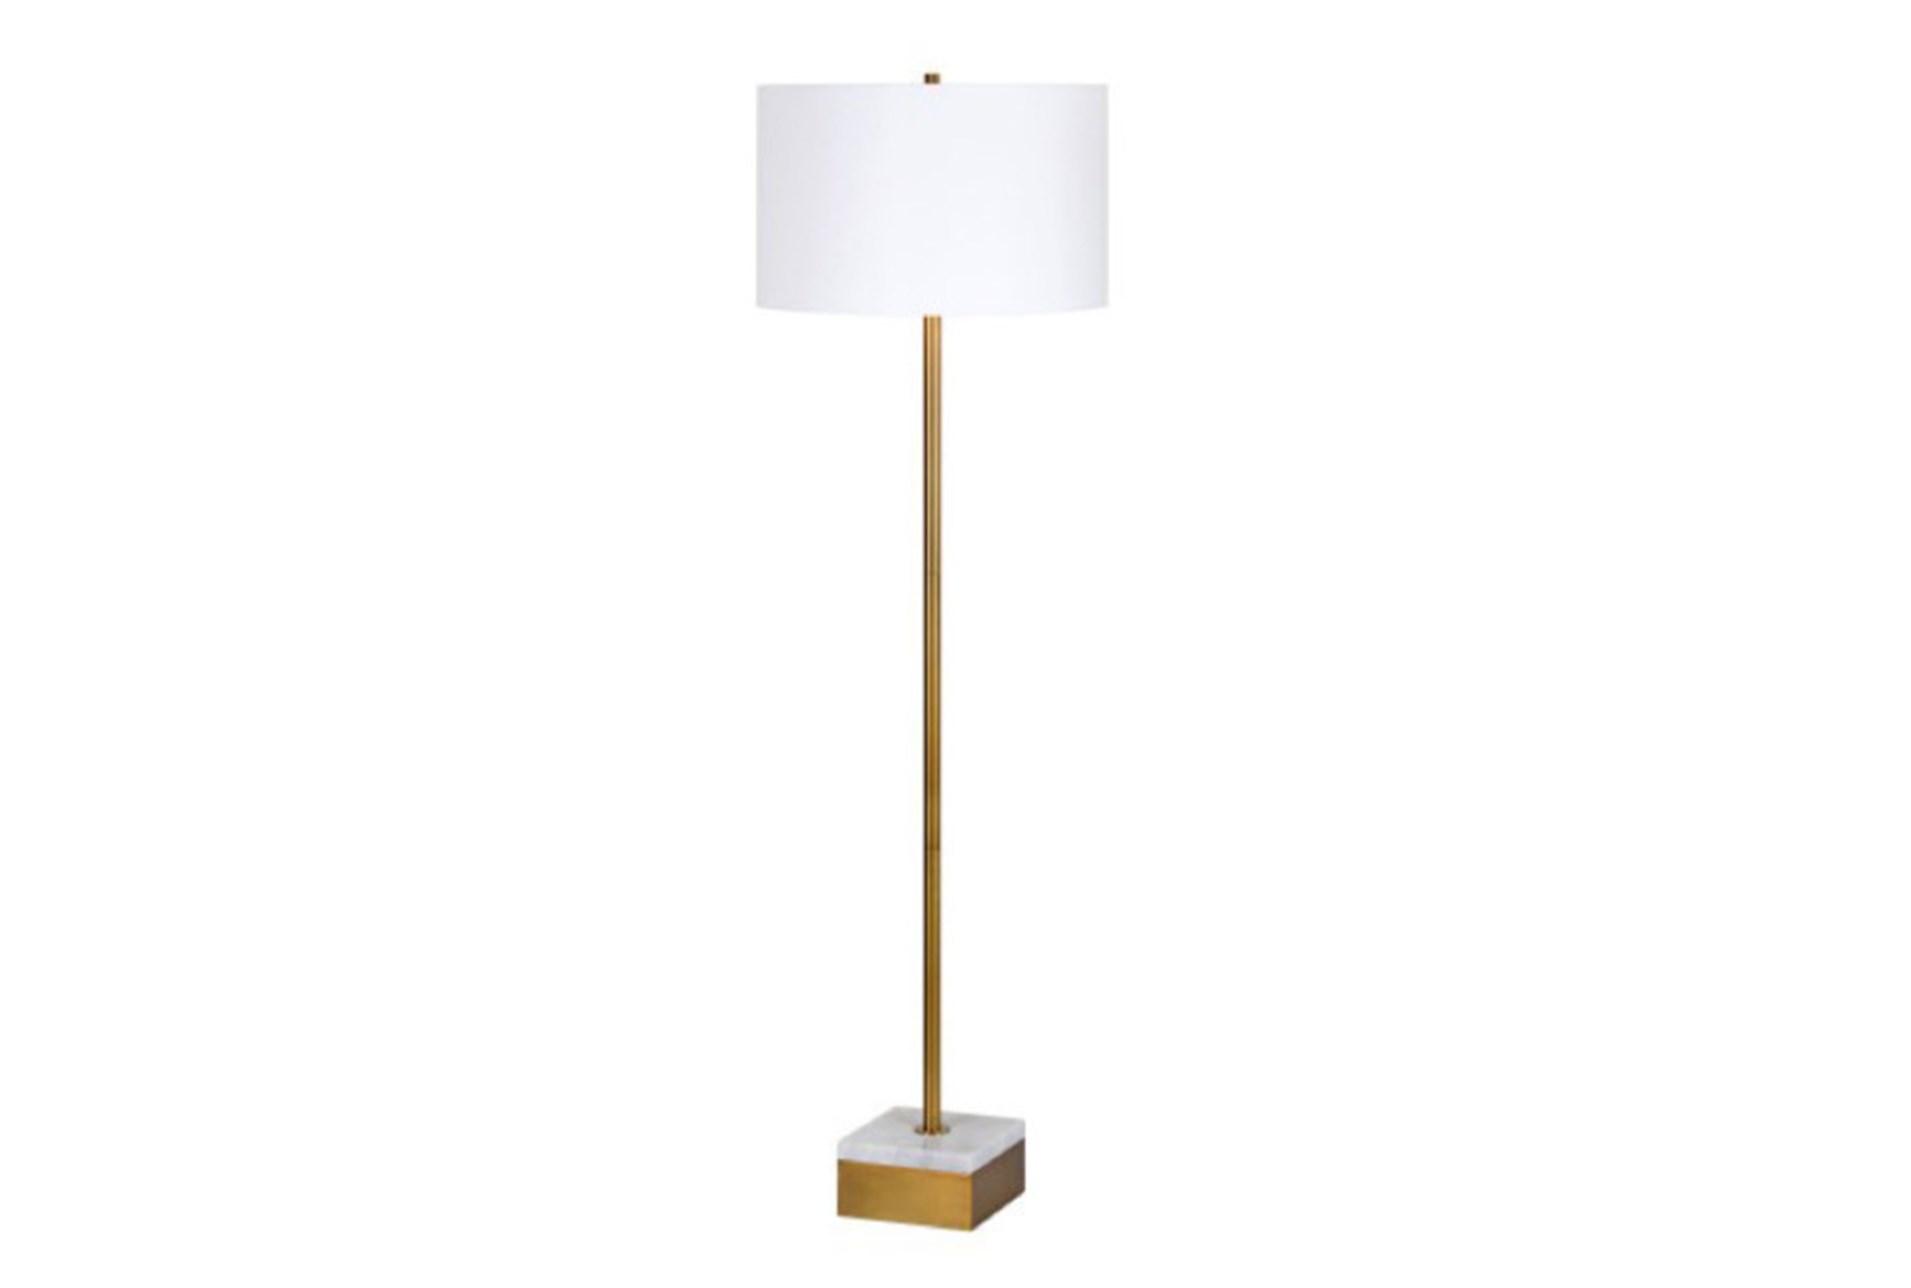 living spaces floor lamps floor lampcroix gold marble 360 living spaces